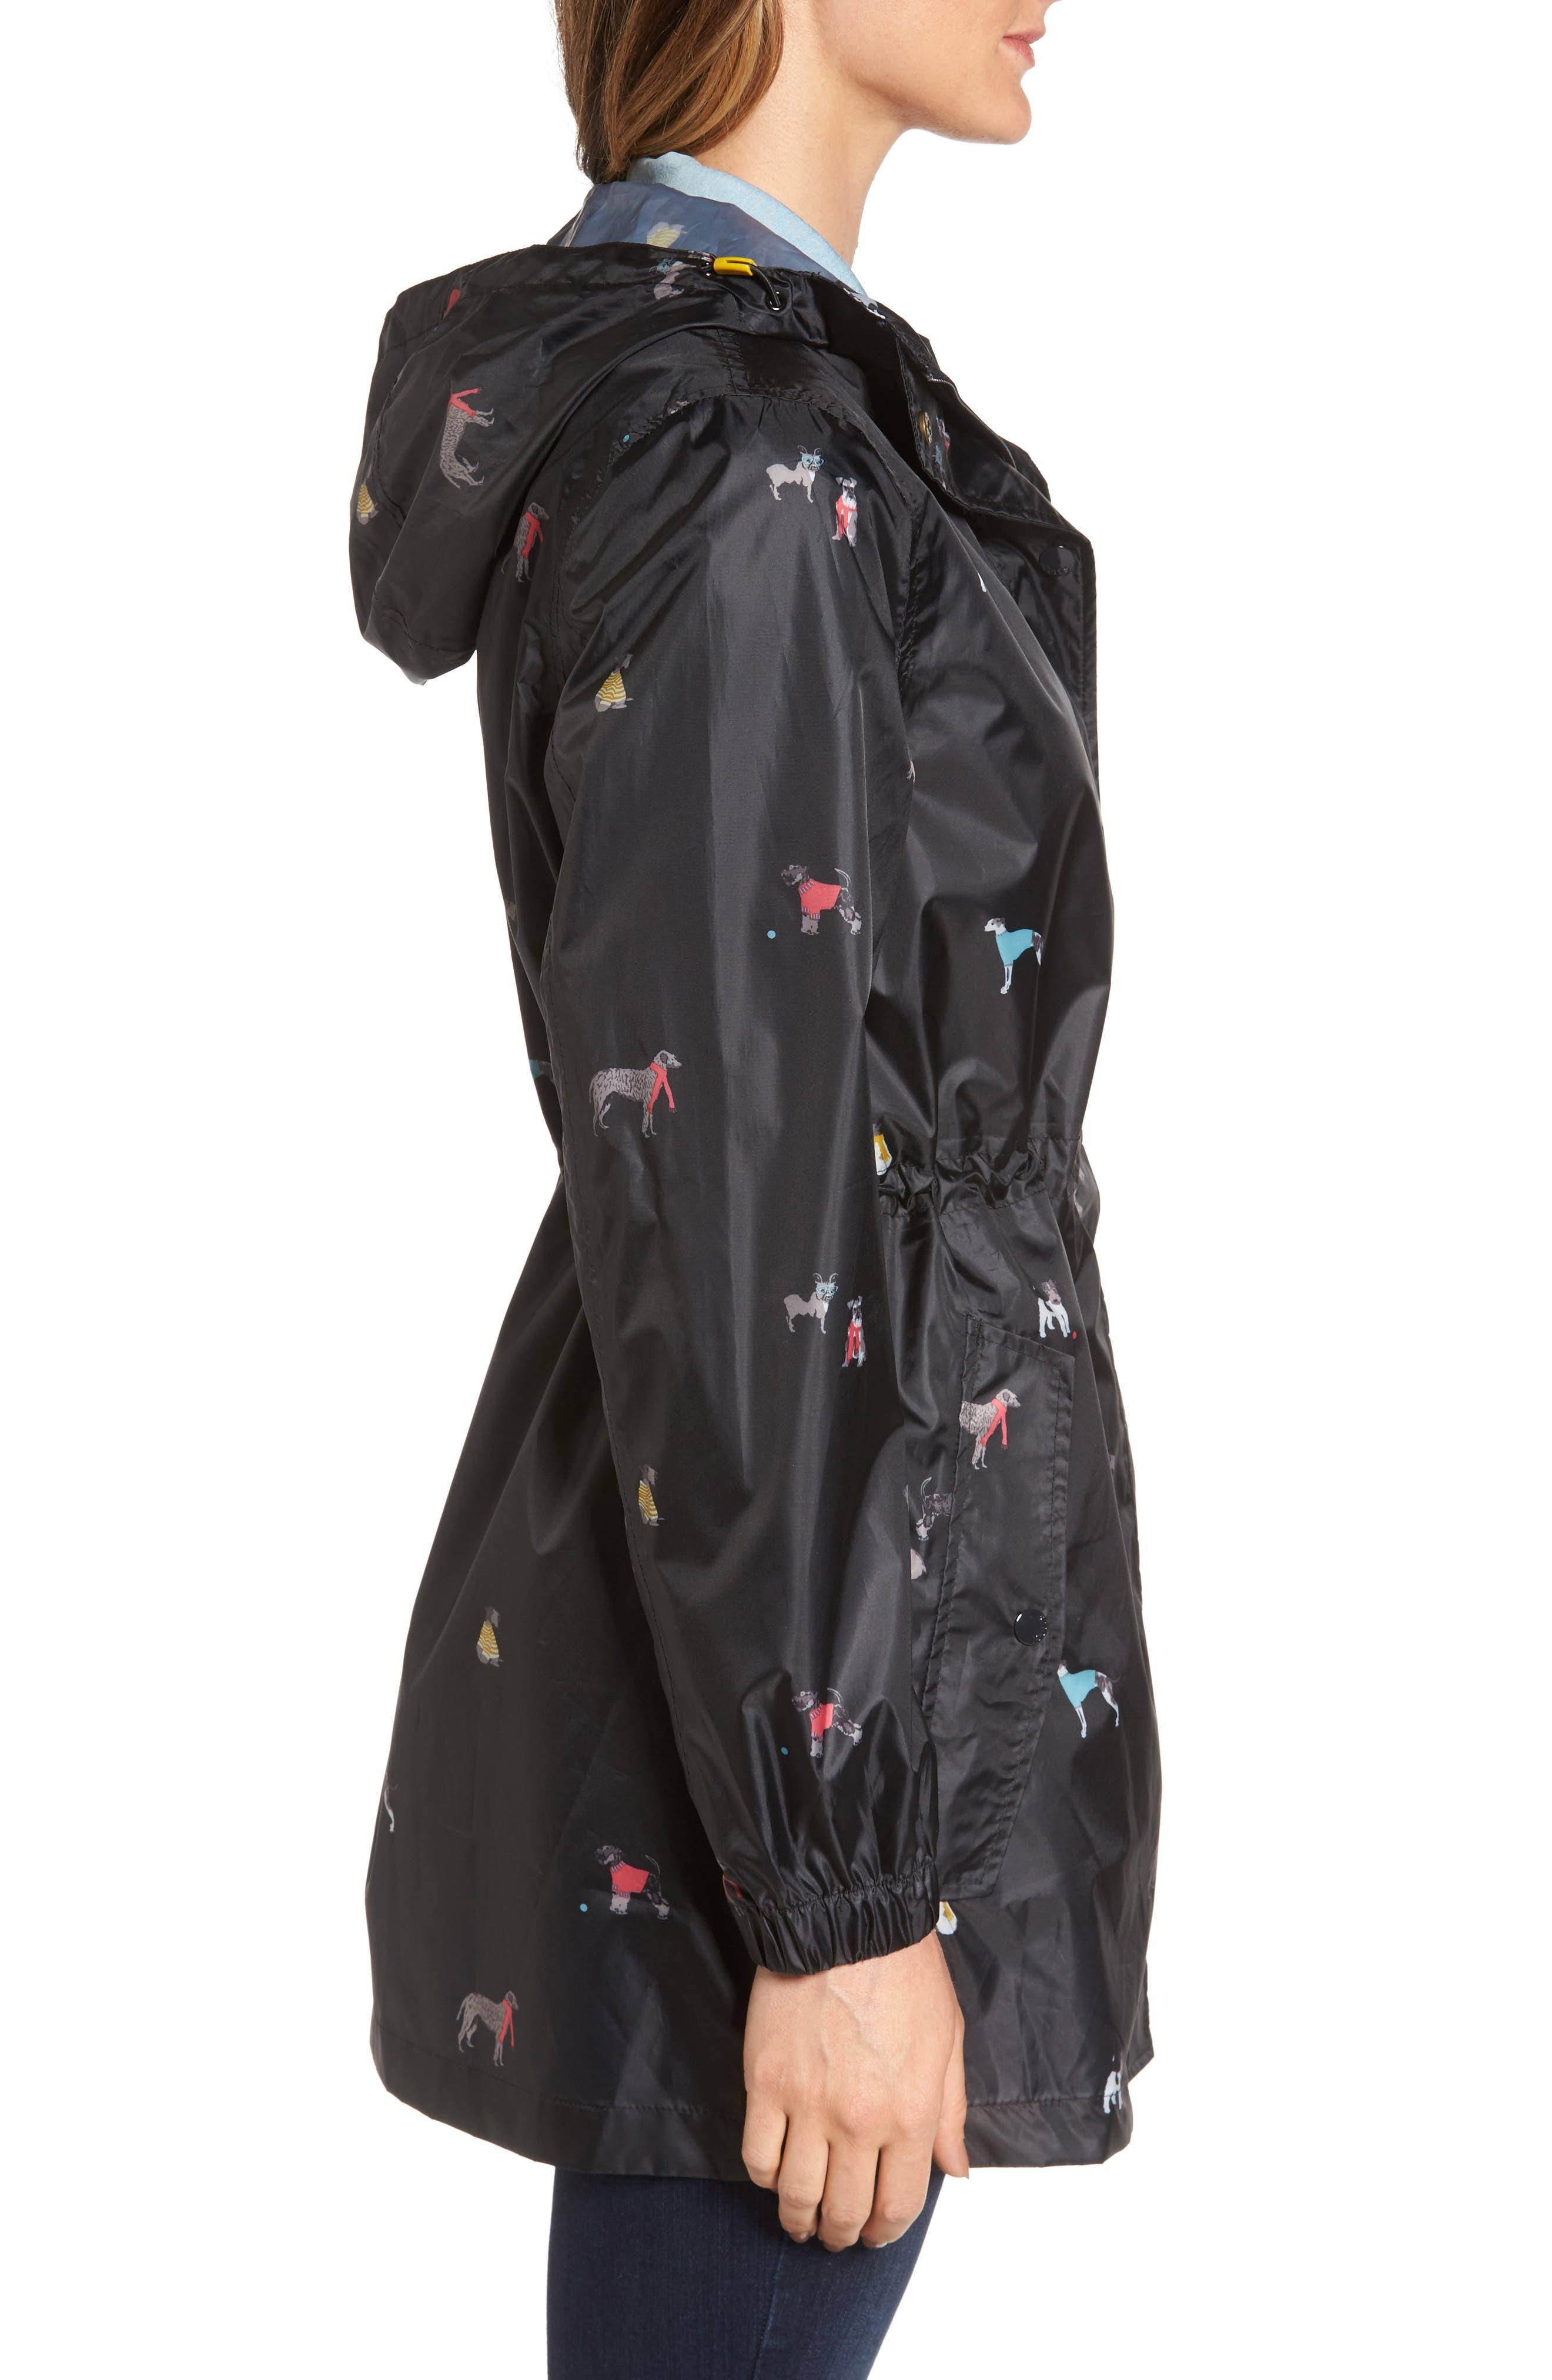 Alternate Image 3  - Joules Right as Rain Packable Print Hooded Raincoat